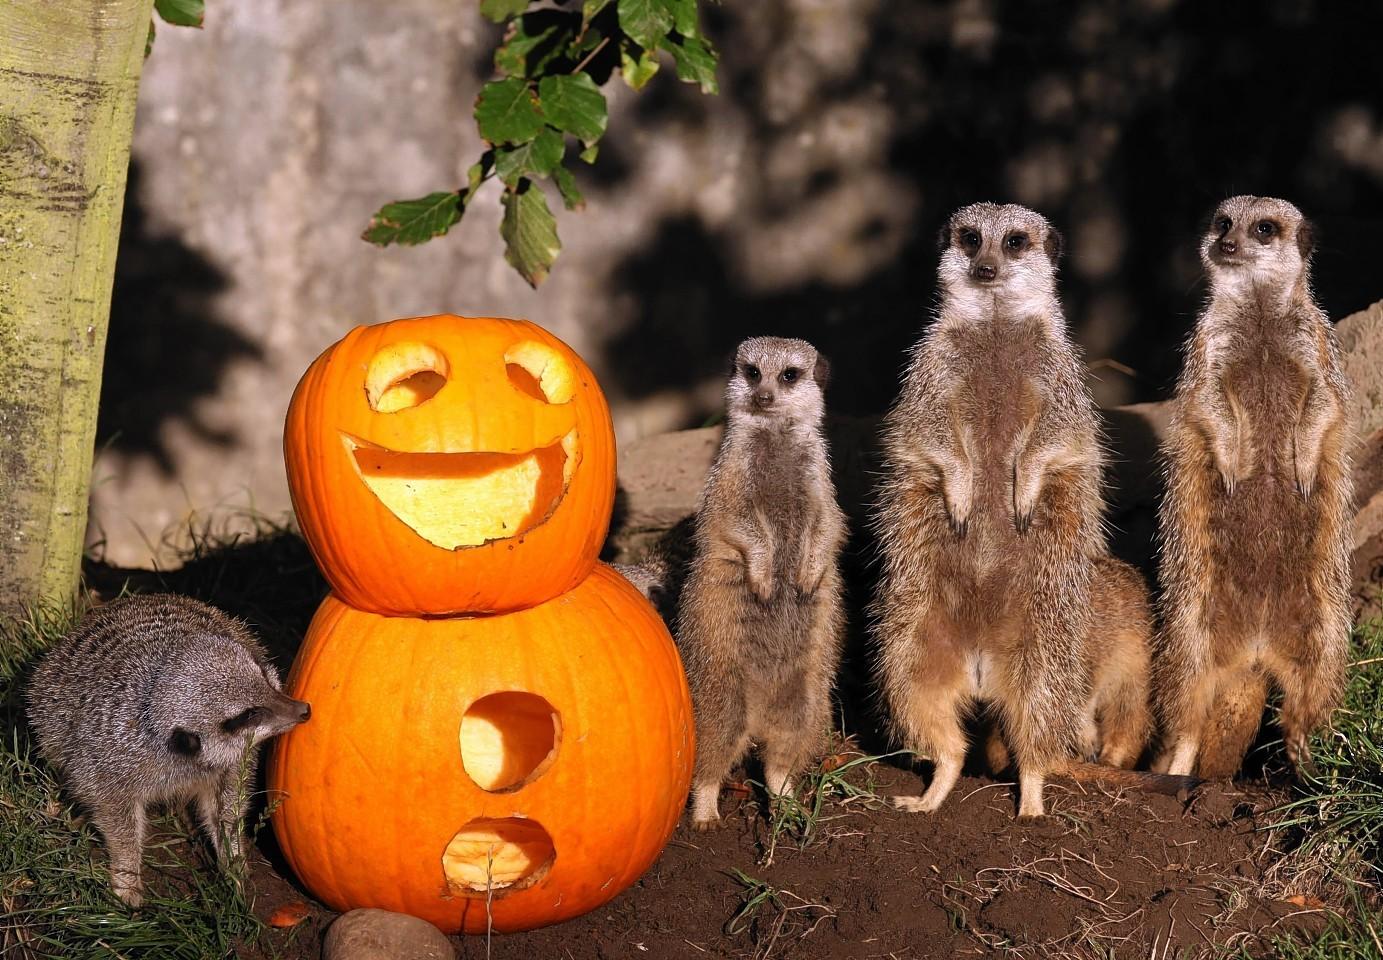 Meerkats and their pumpkins